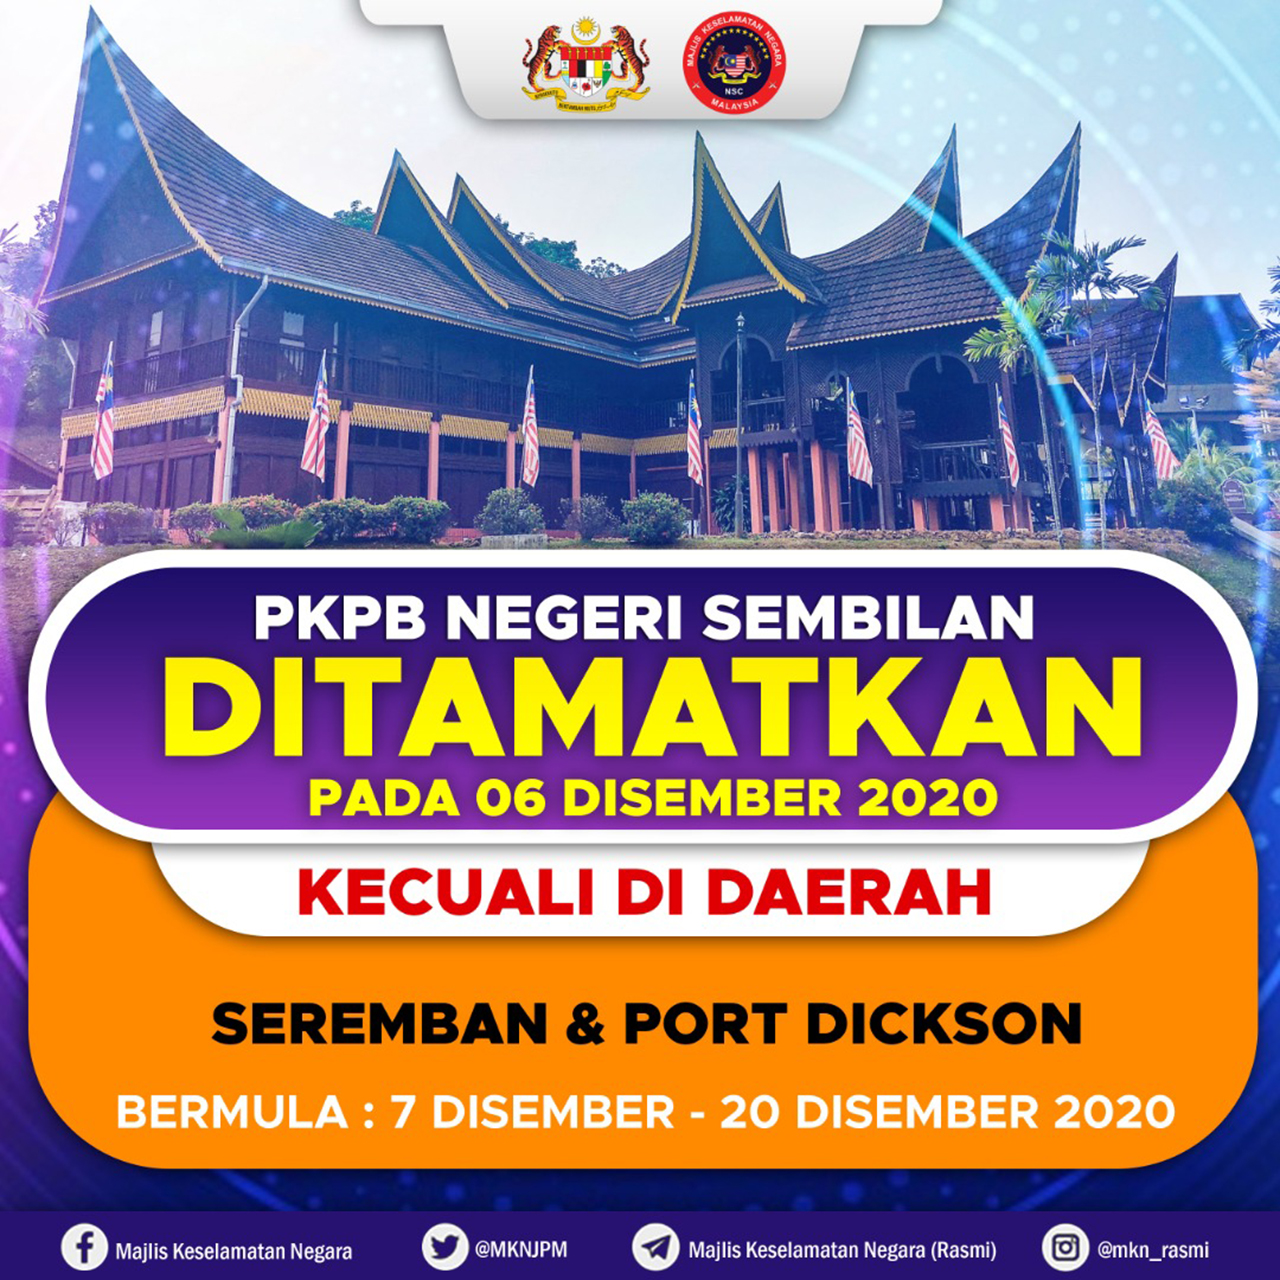 PKPB Seremban sampai 20 Disember 2020